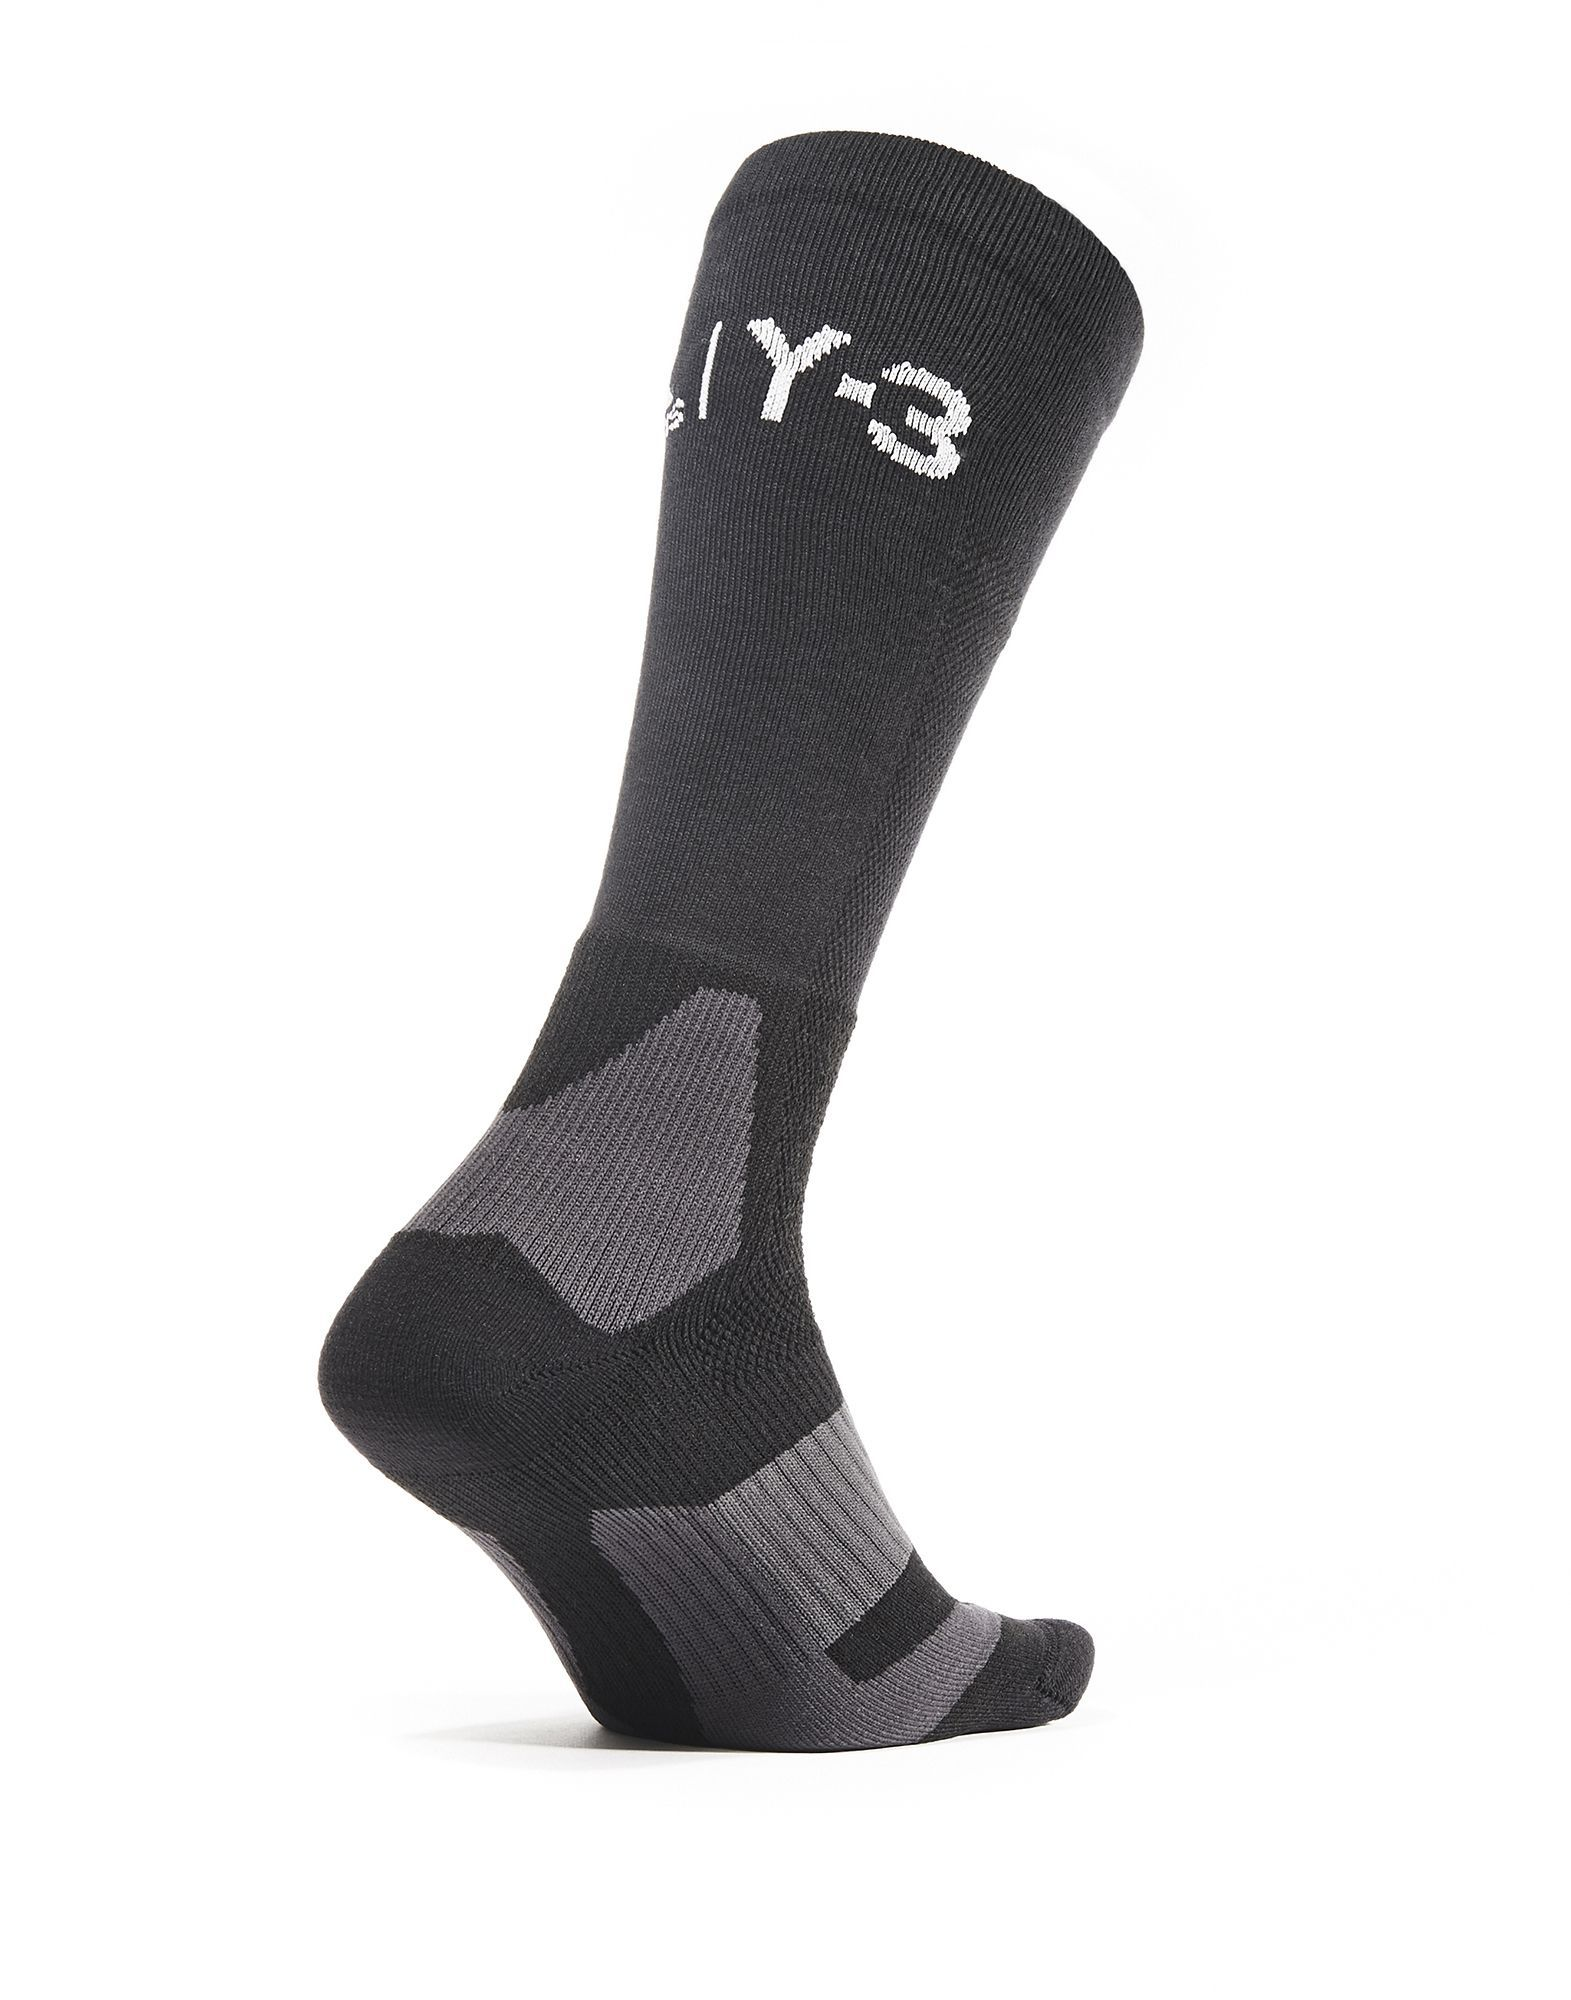 Image result for y-3 socks  a7bcbafcc25